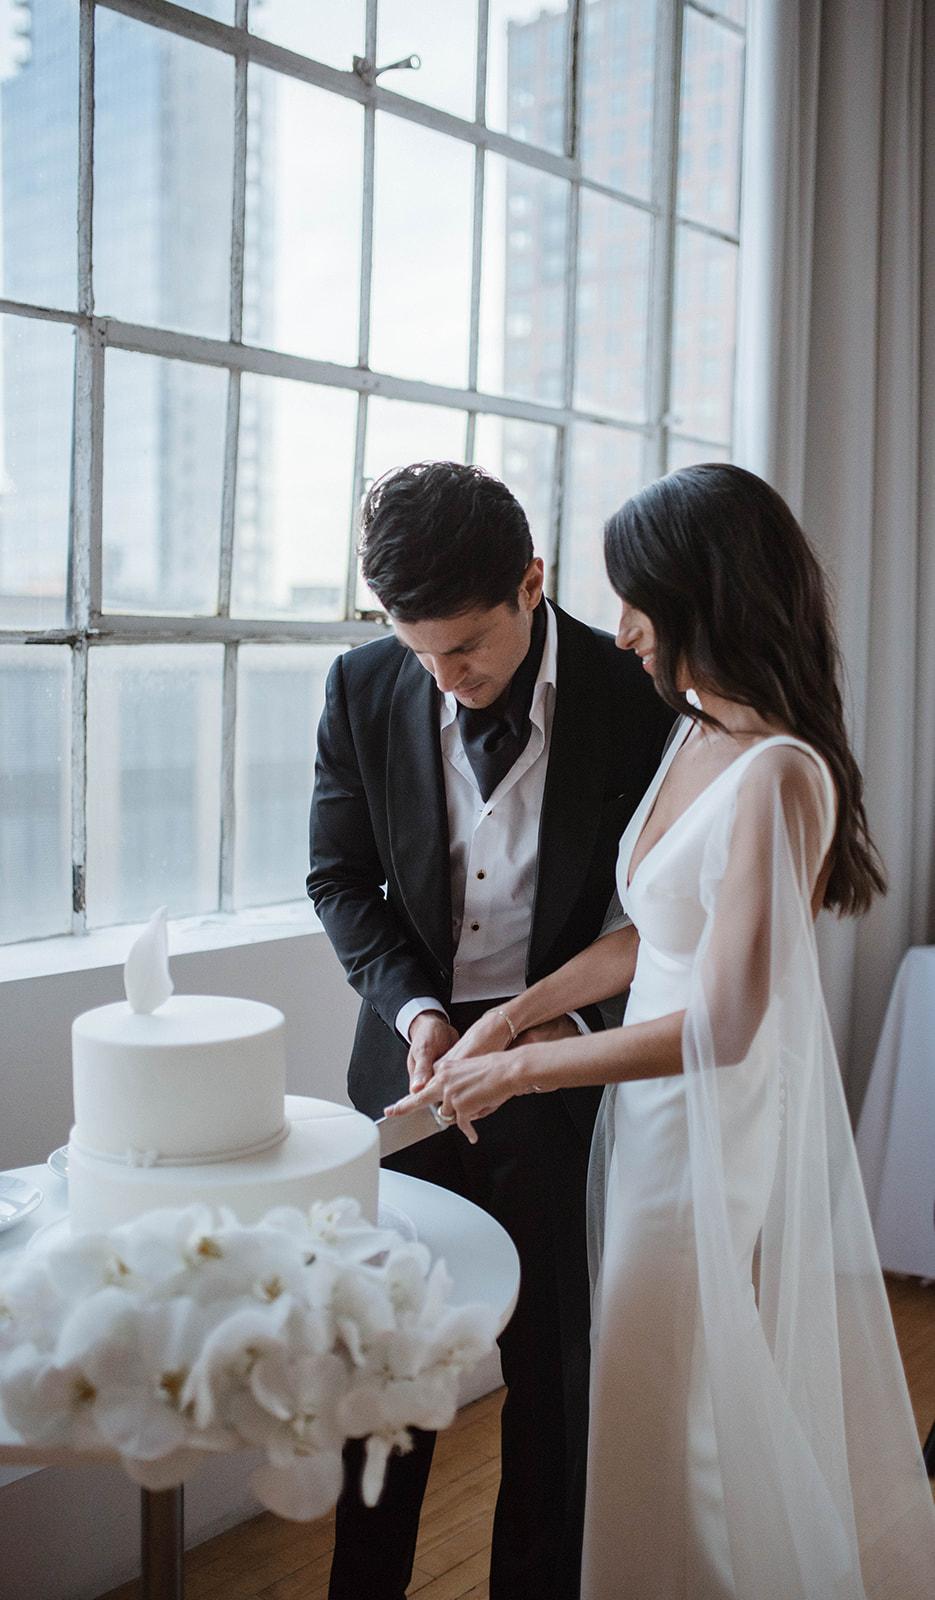 Jenna___Austin_Wedding_Day-_LHP-908.jpg